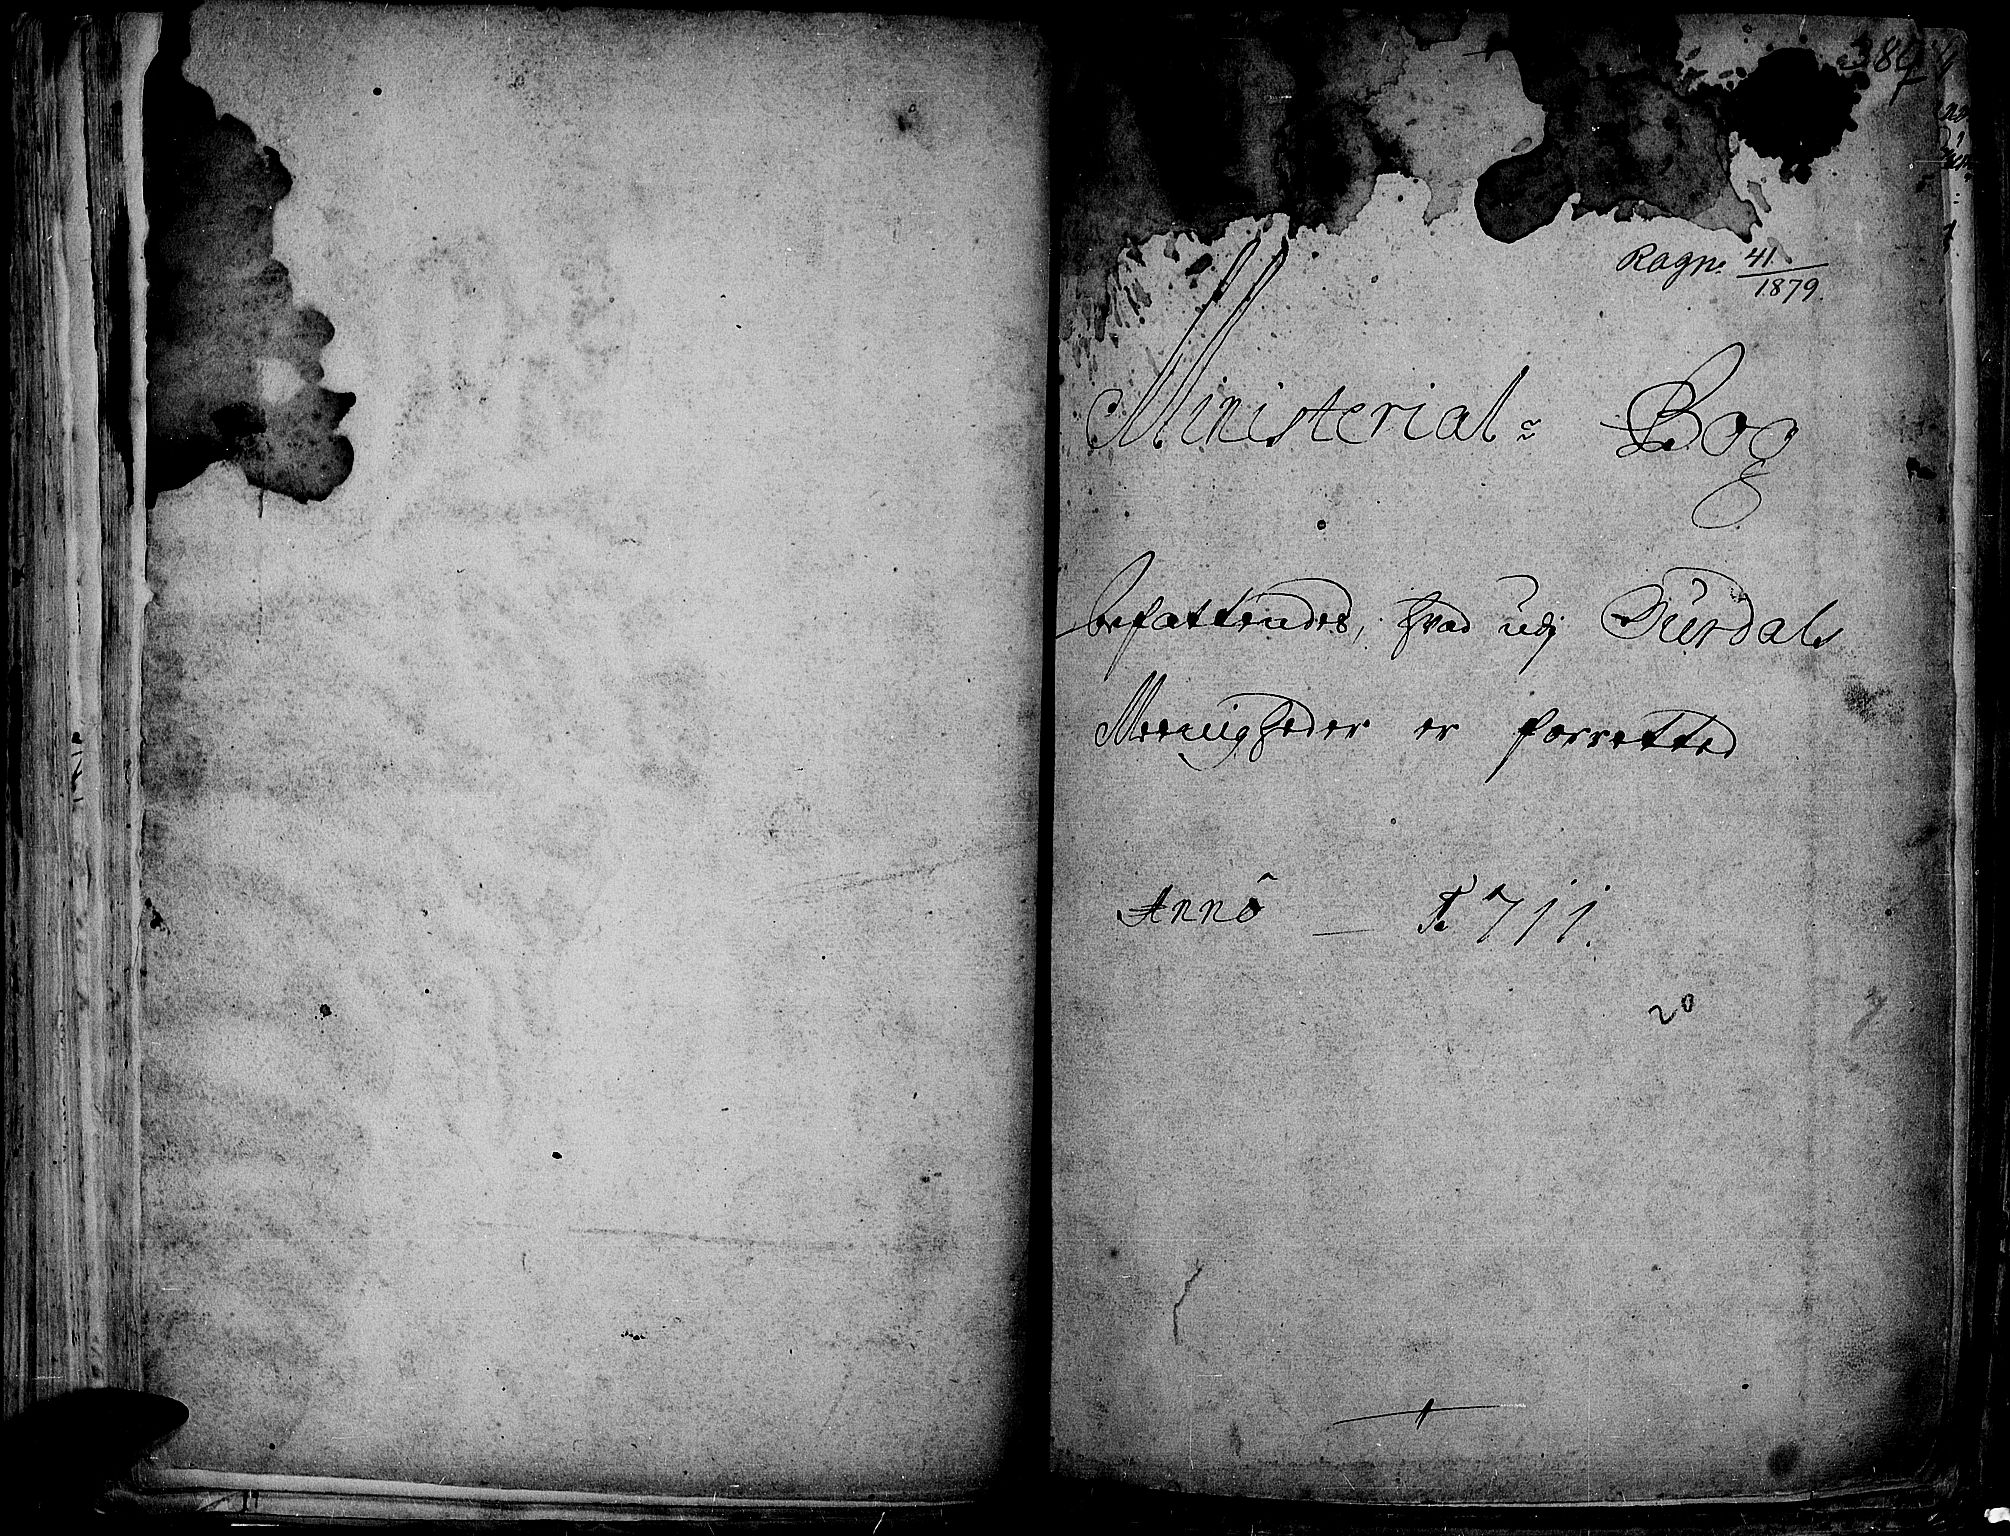 SAH, Aurdal prestekontor, Ministerialbok nr. 1-3, 1692-1730, s. 387